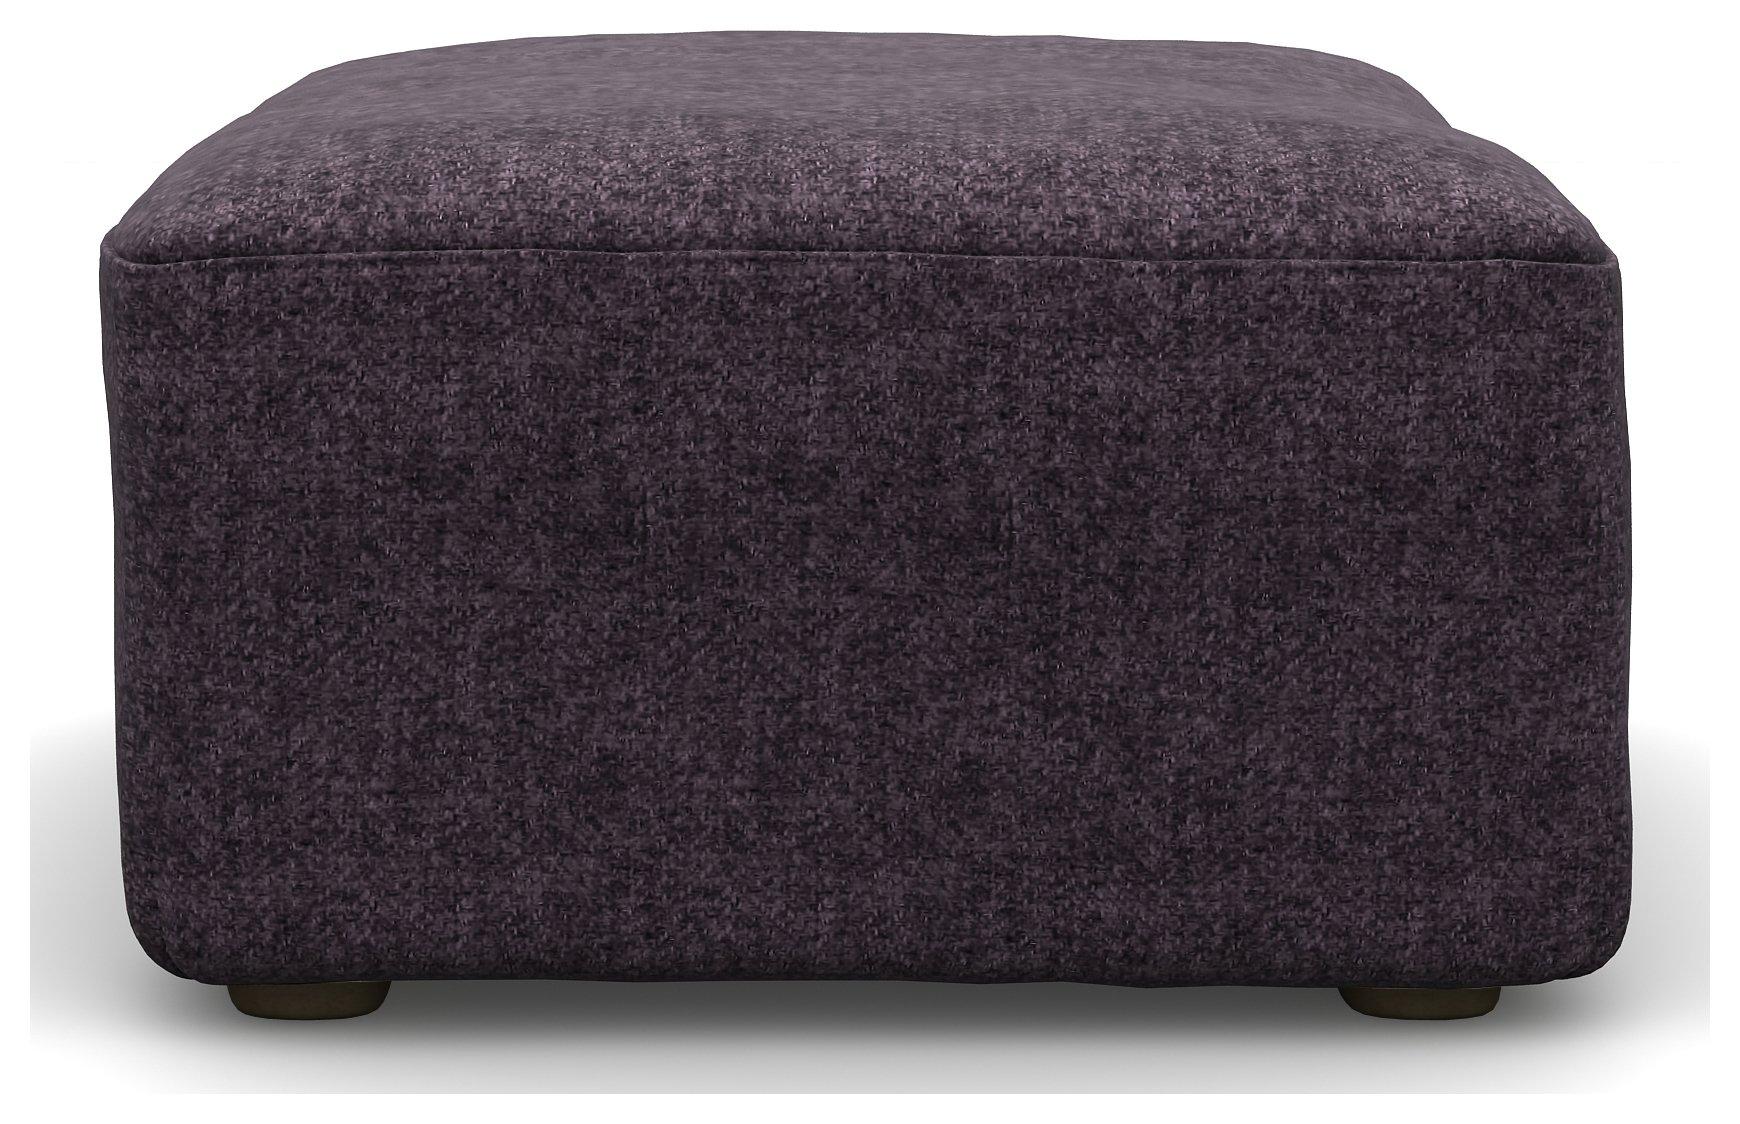 Heart of House Lincoln Tweed Fabric Footstool - Purple.